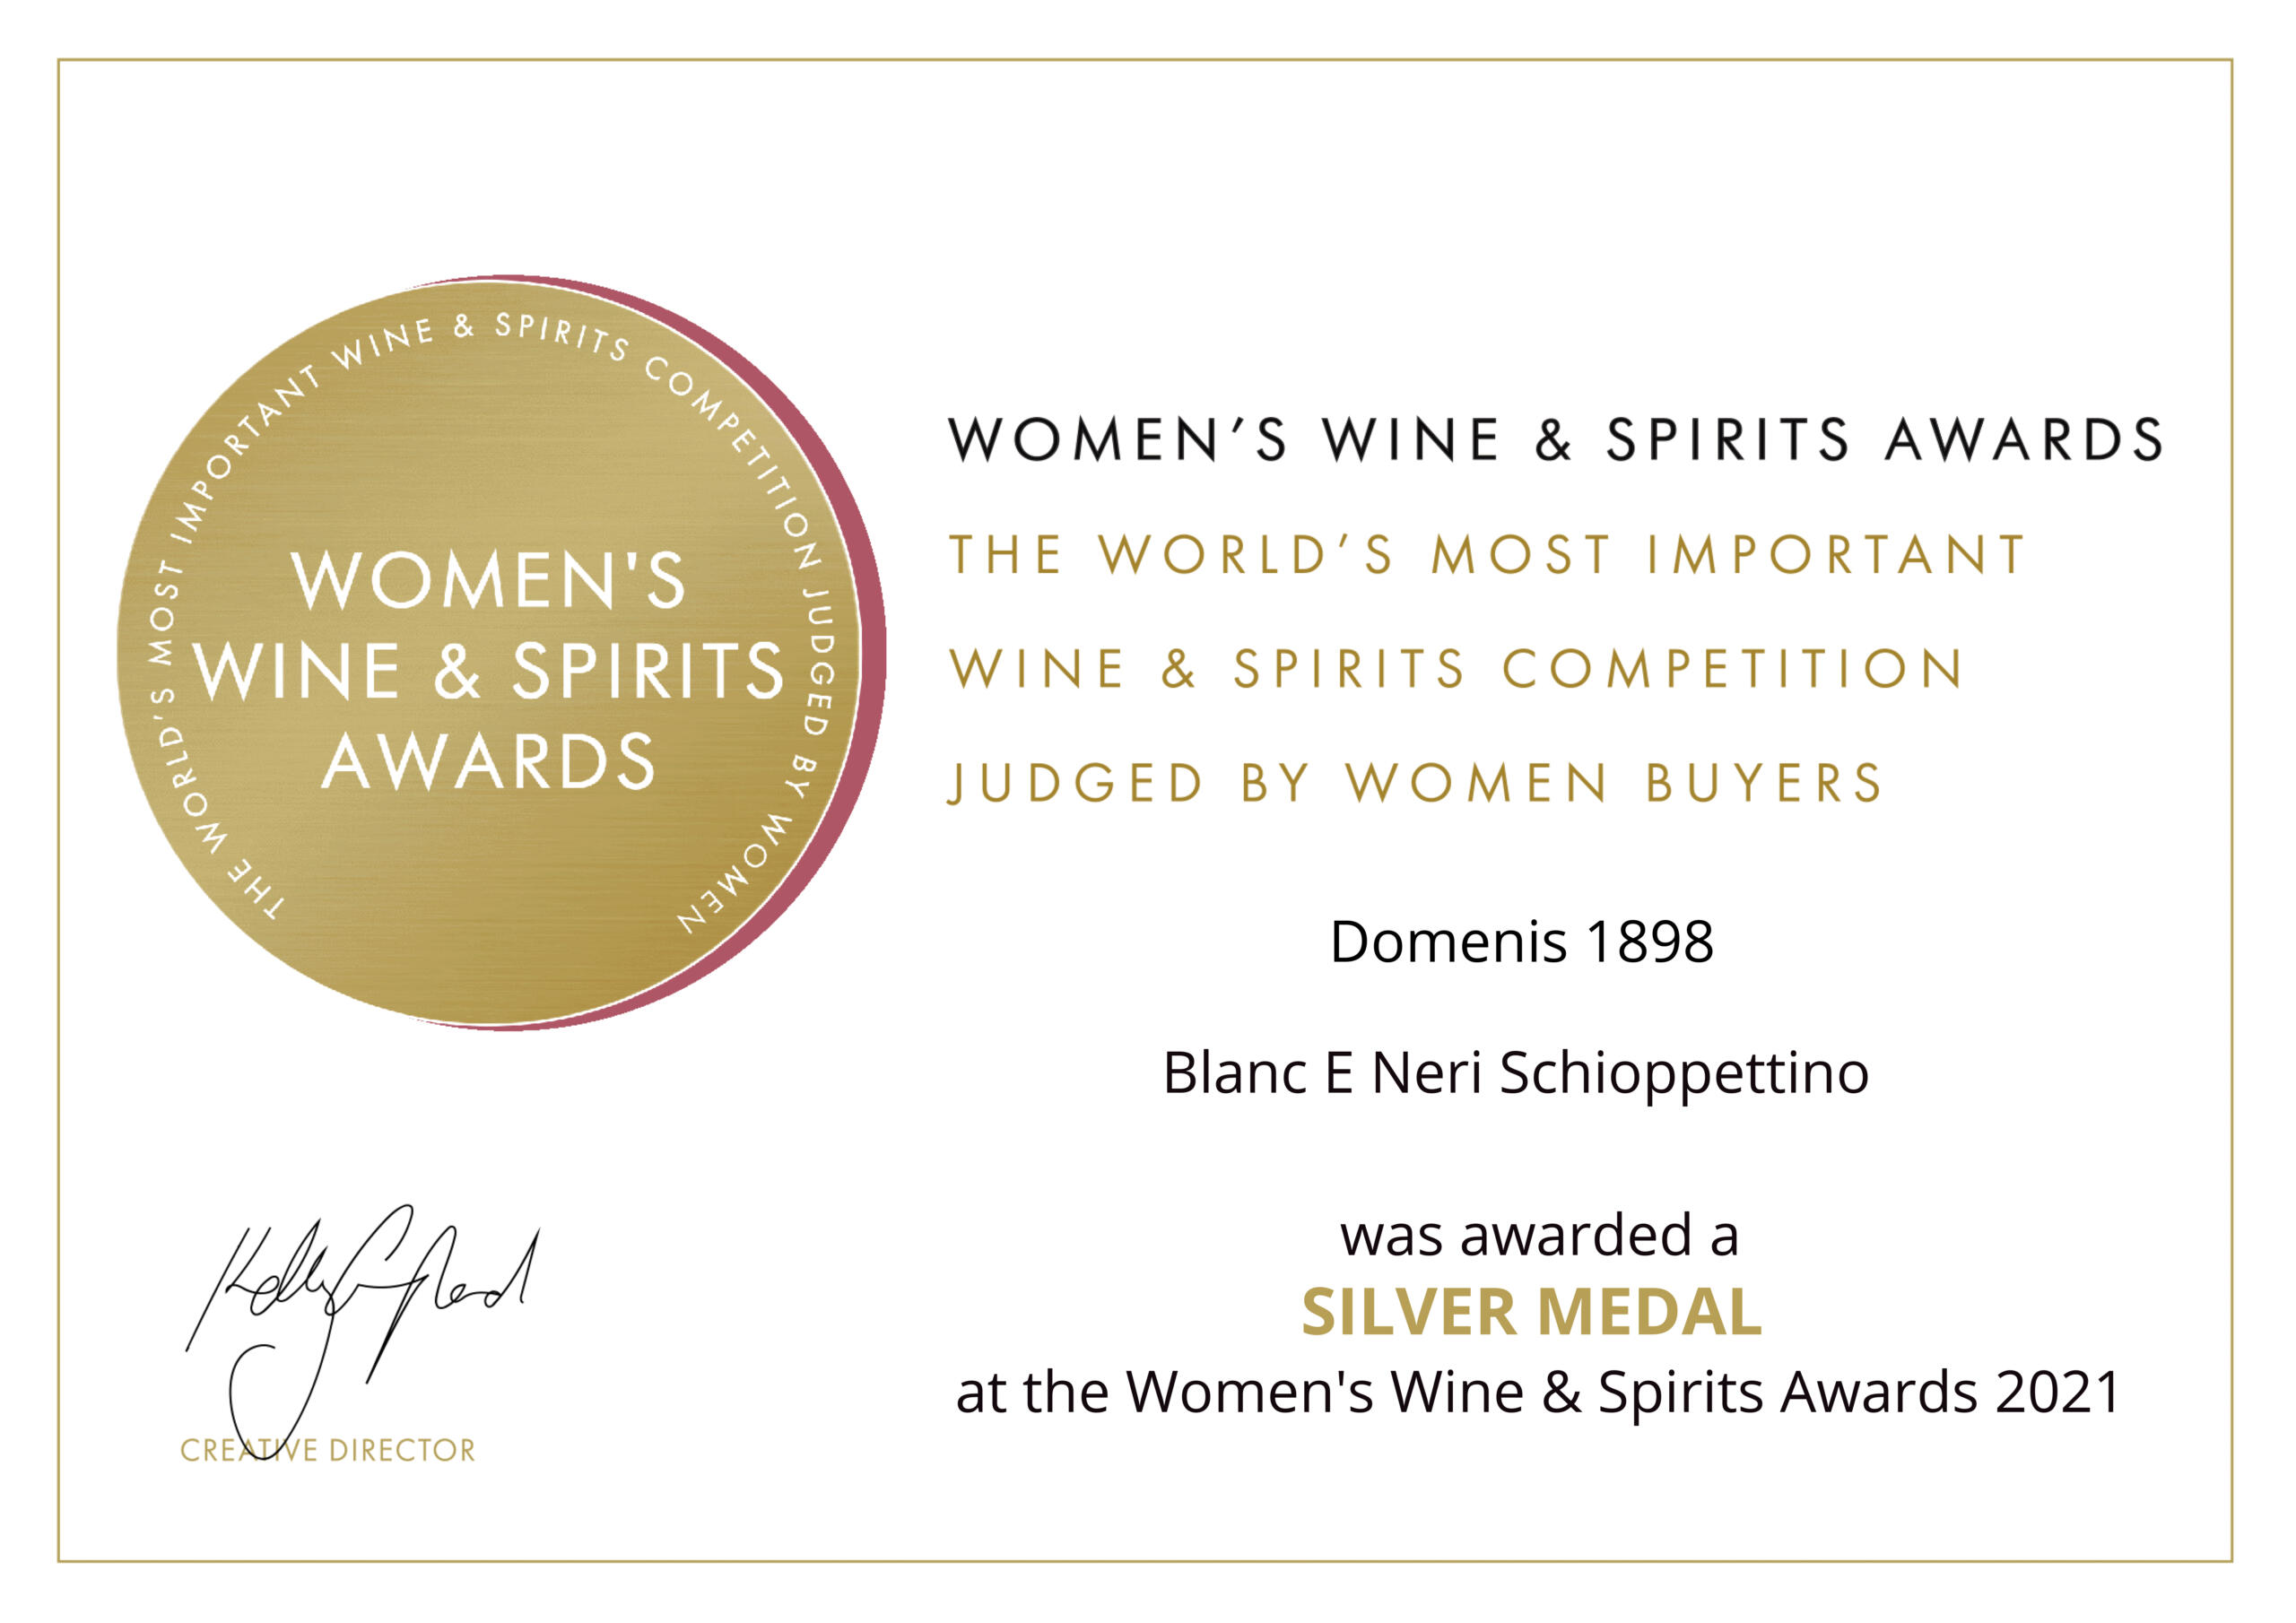 Women's Wine & Spirit Awards 2021 – Silver Medal – Blanc e Neri – Schioppettino